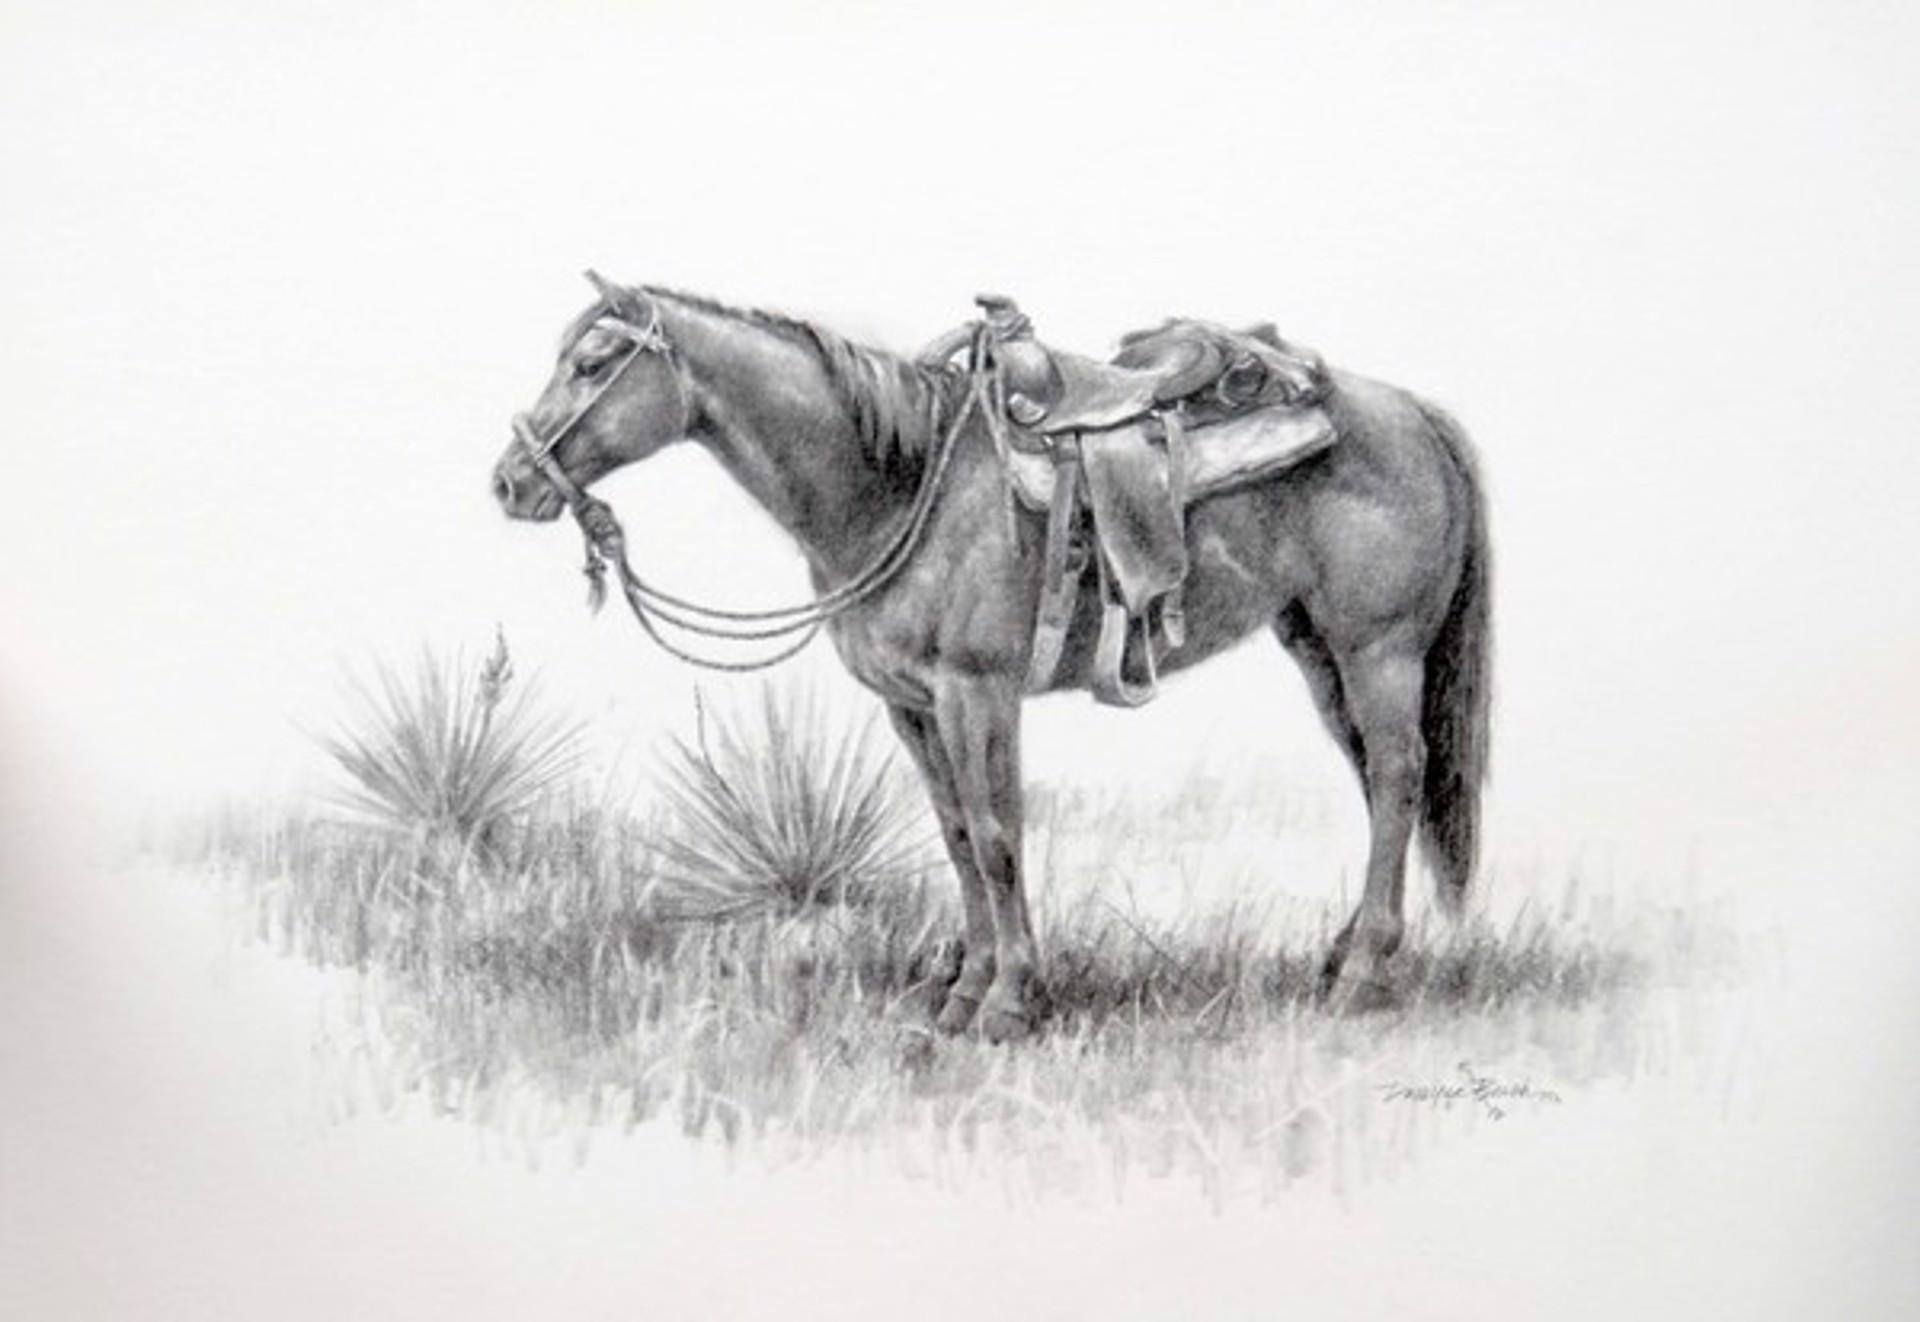 Horse by Dwayne Brech